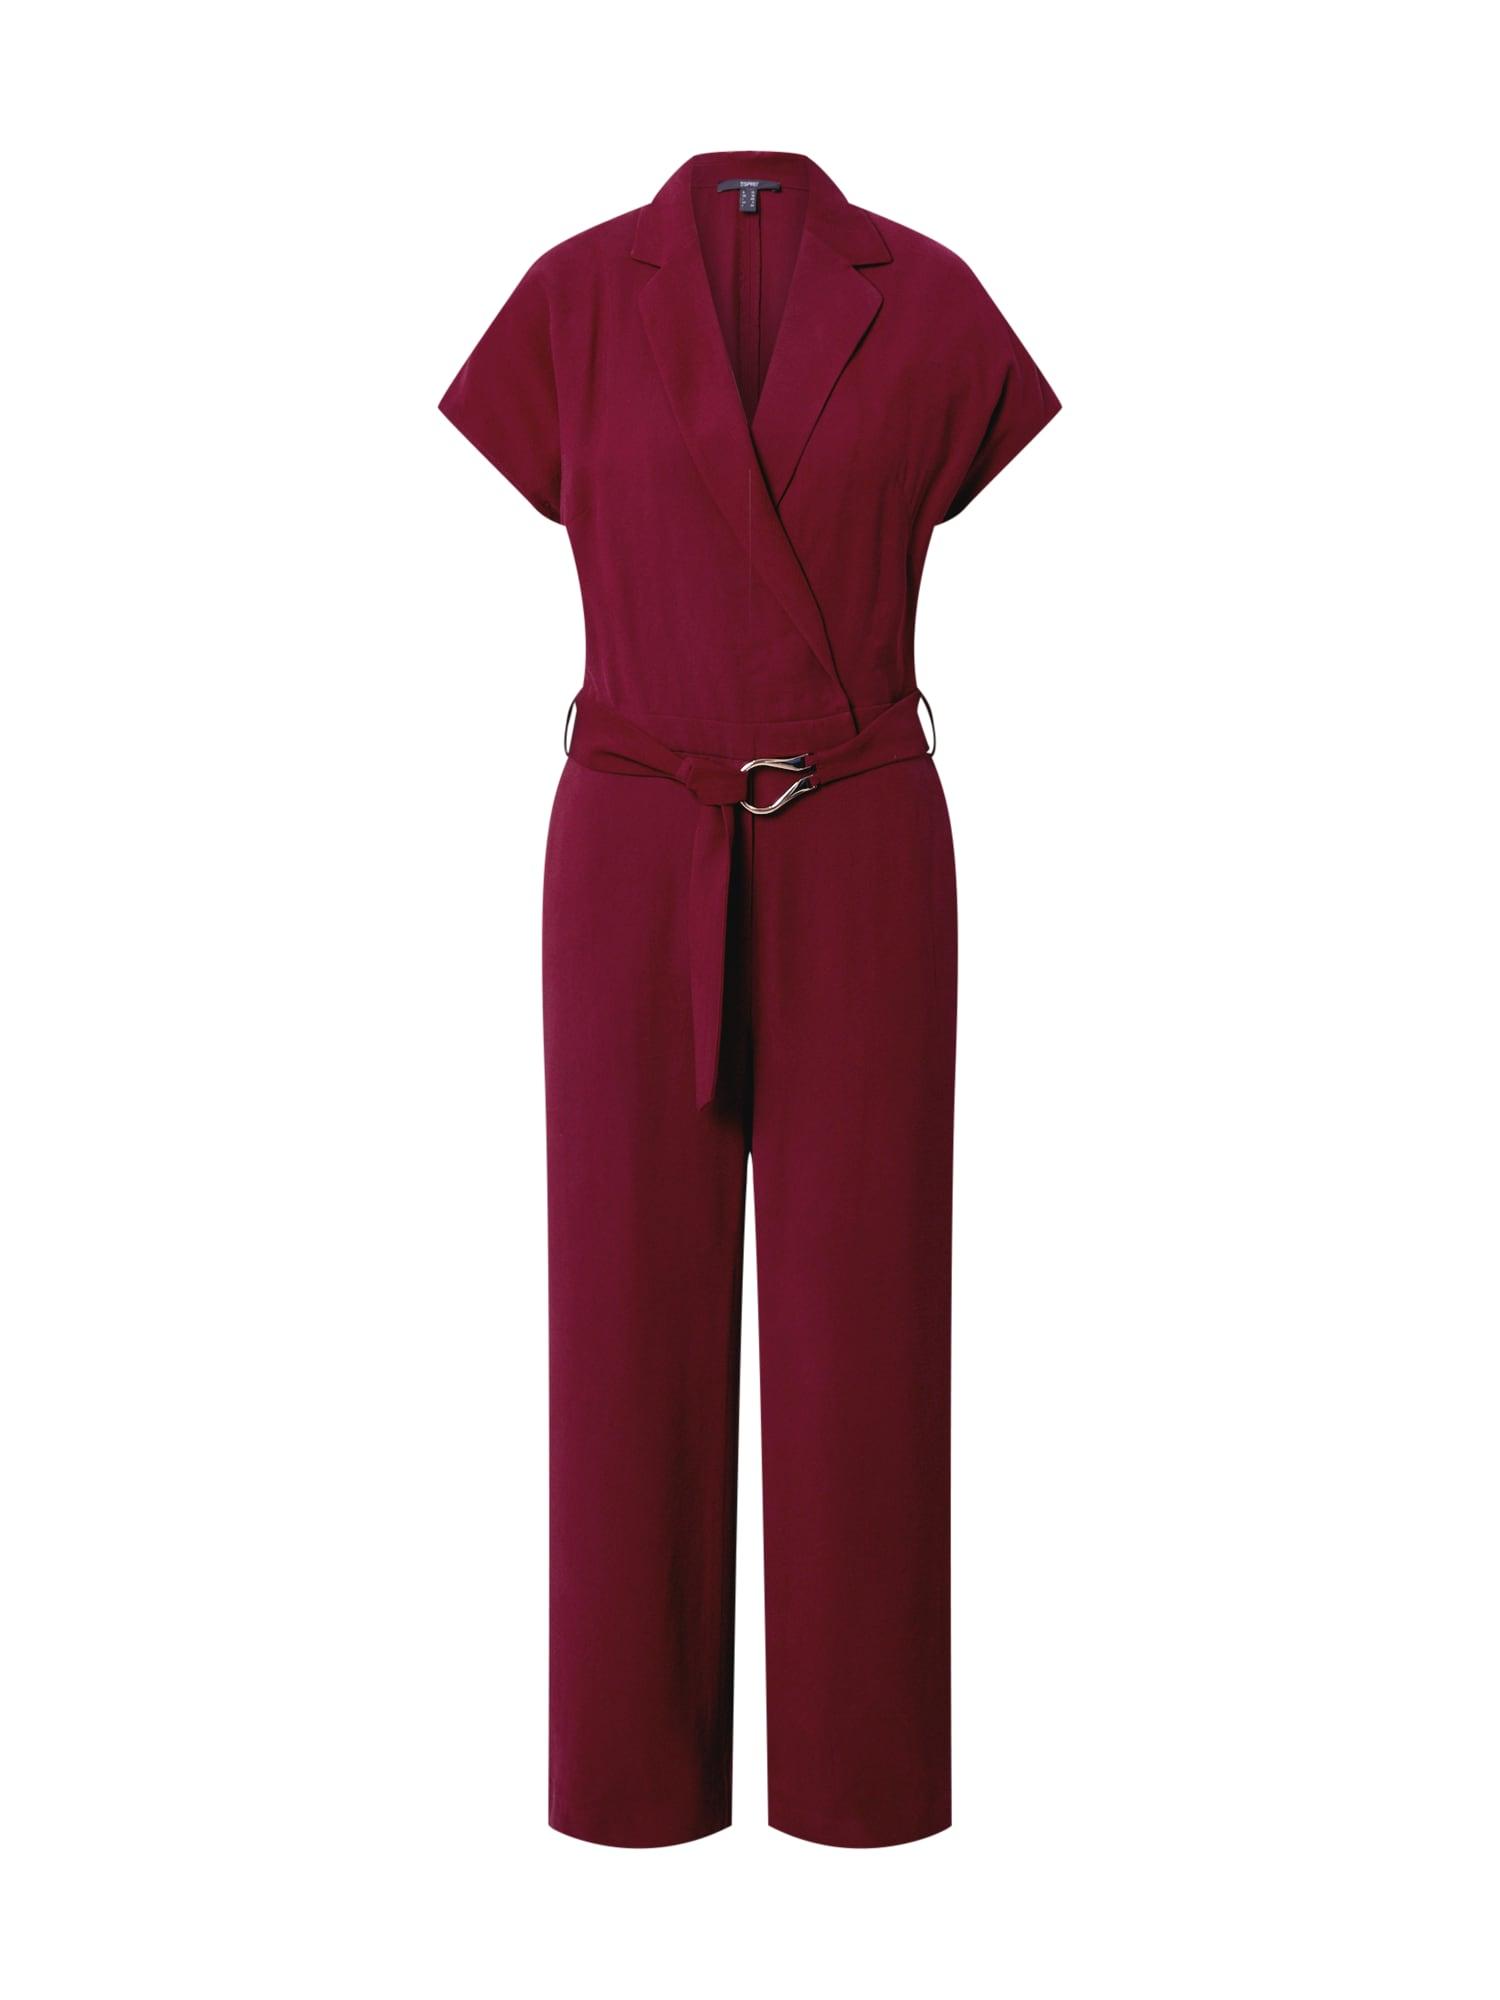 Esprit Collection Vienos dalies kostiumas vyšninė spalva